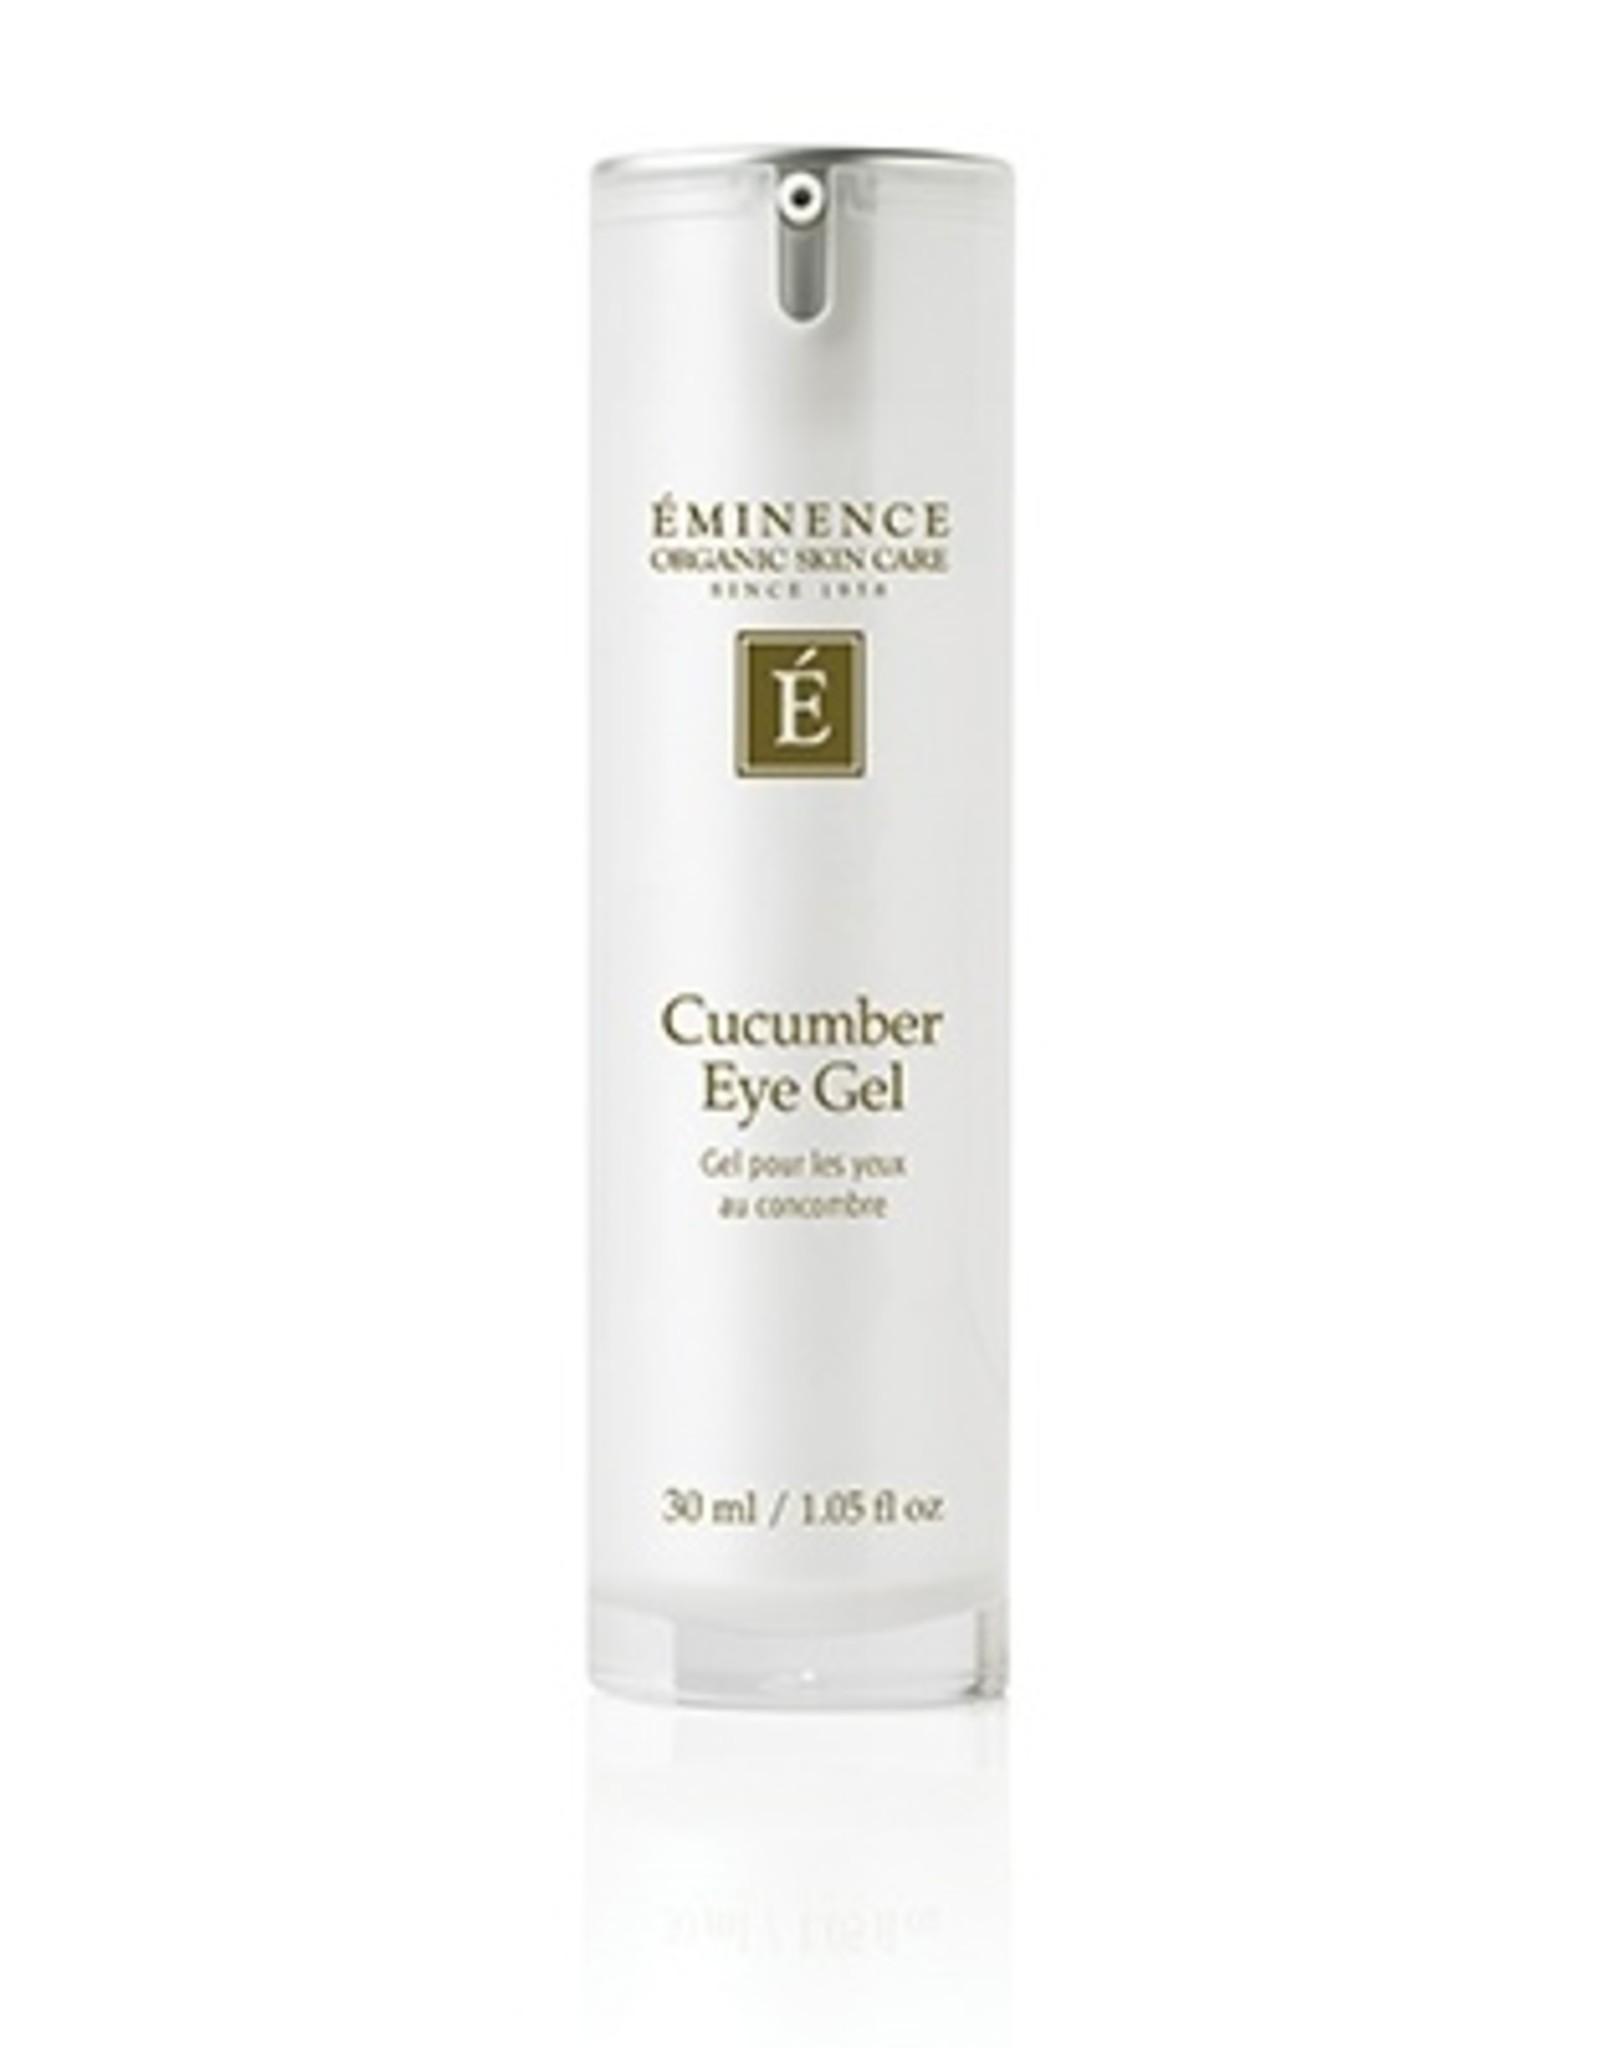 Eminence Organic Skin Care Cucumber Eye Gel